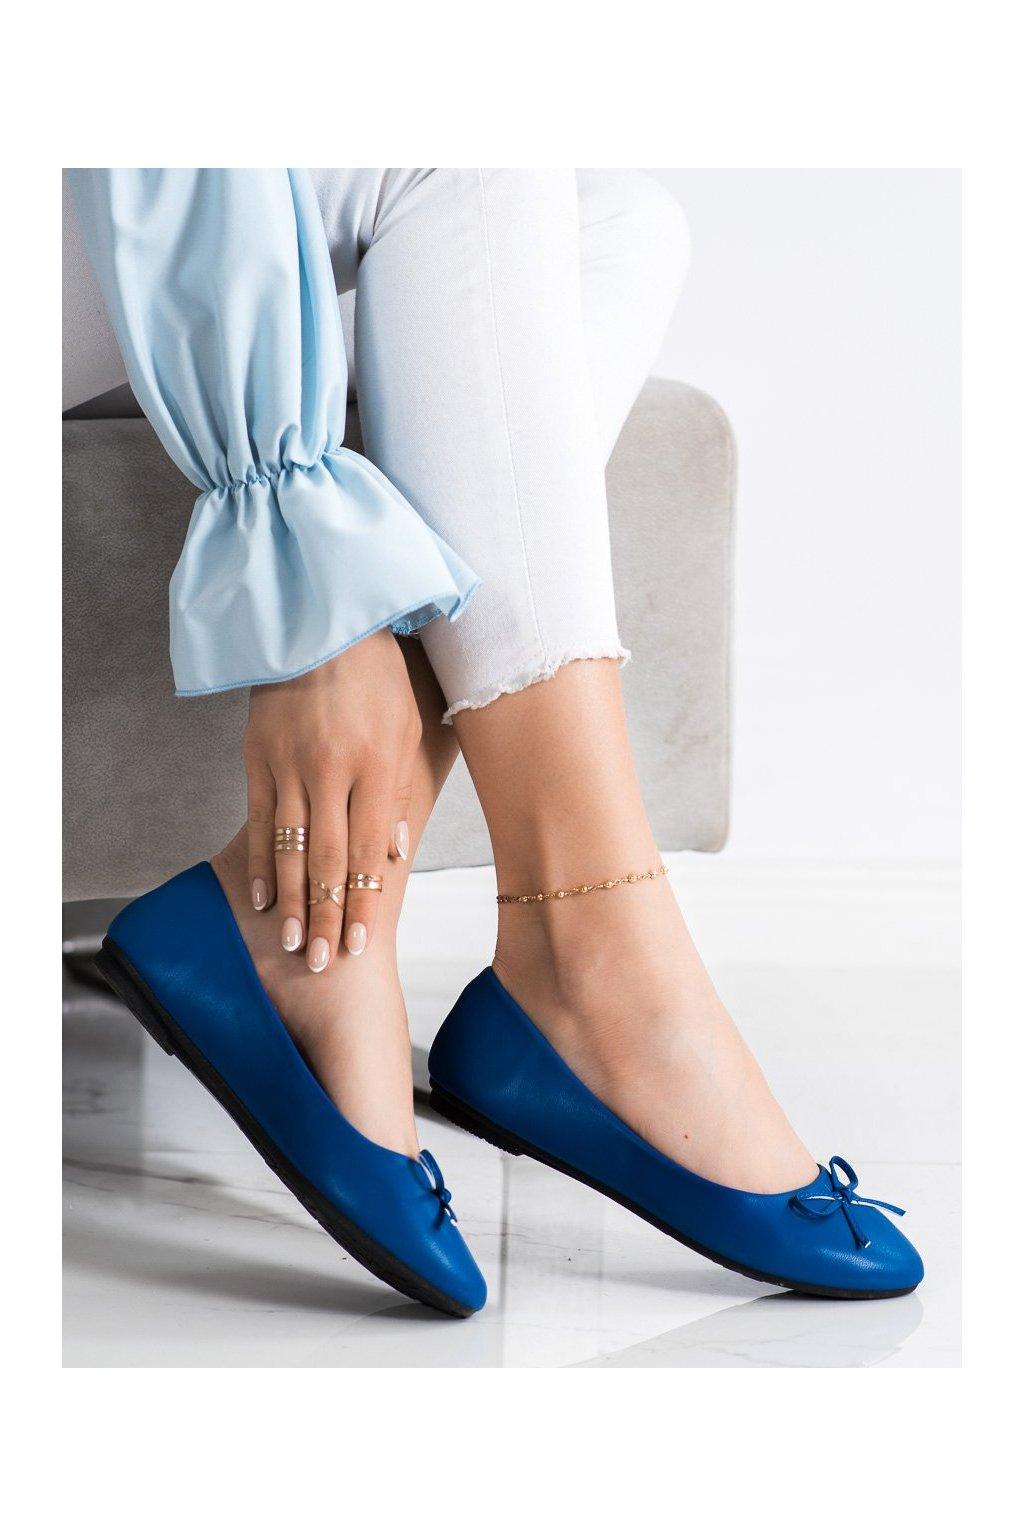 Modré dámske balerínky Diamantique kod 9988-138BL